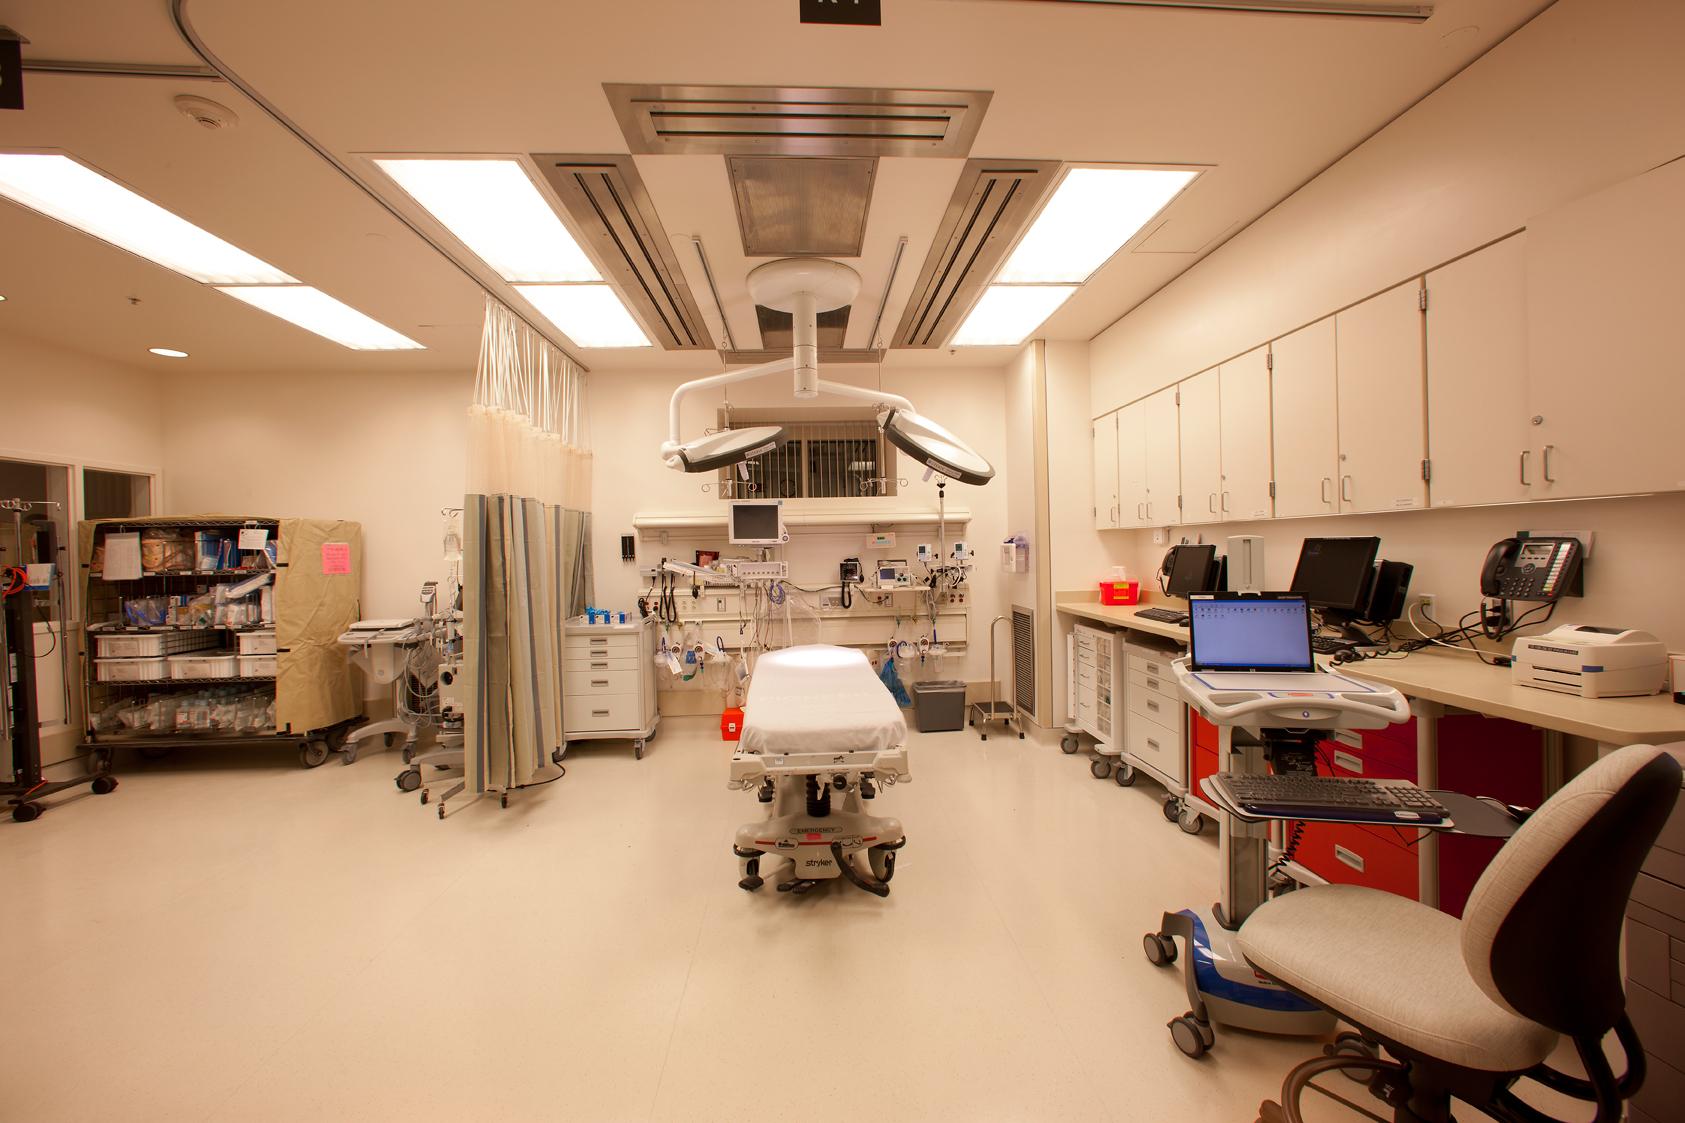 Uc Davis Medical Center Ed Asmus Photo Journal